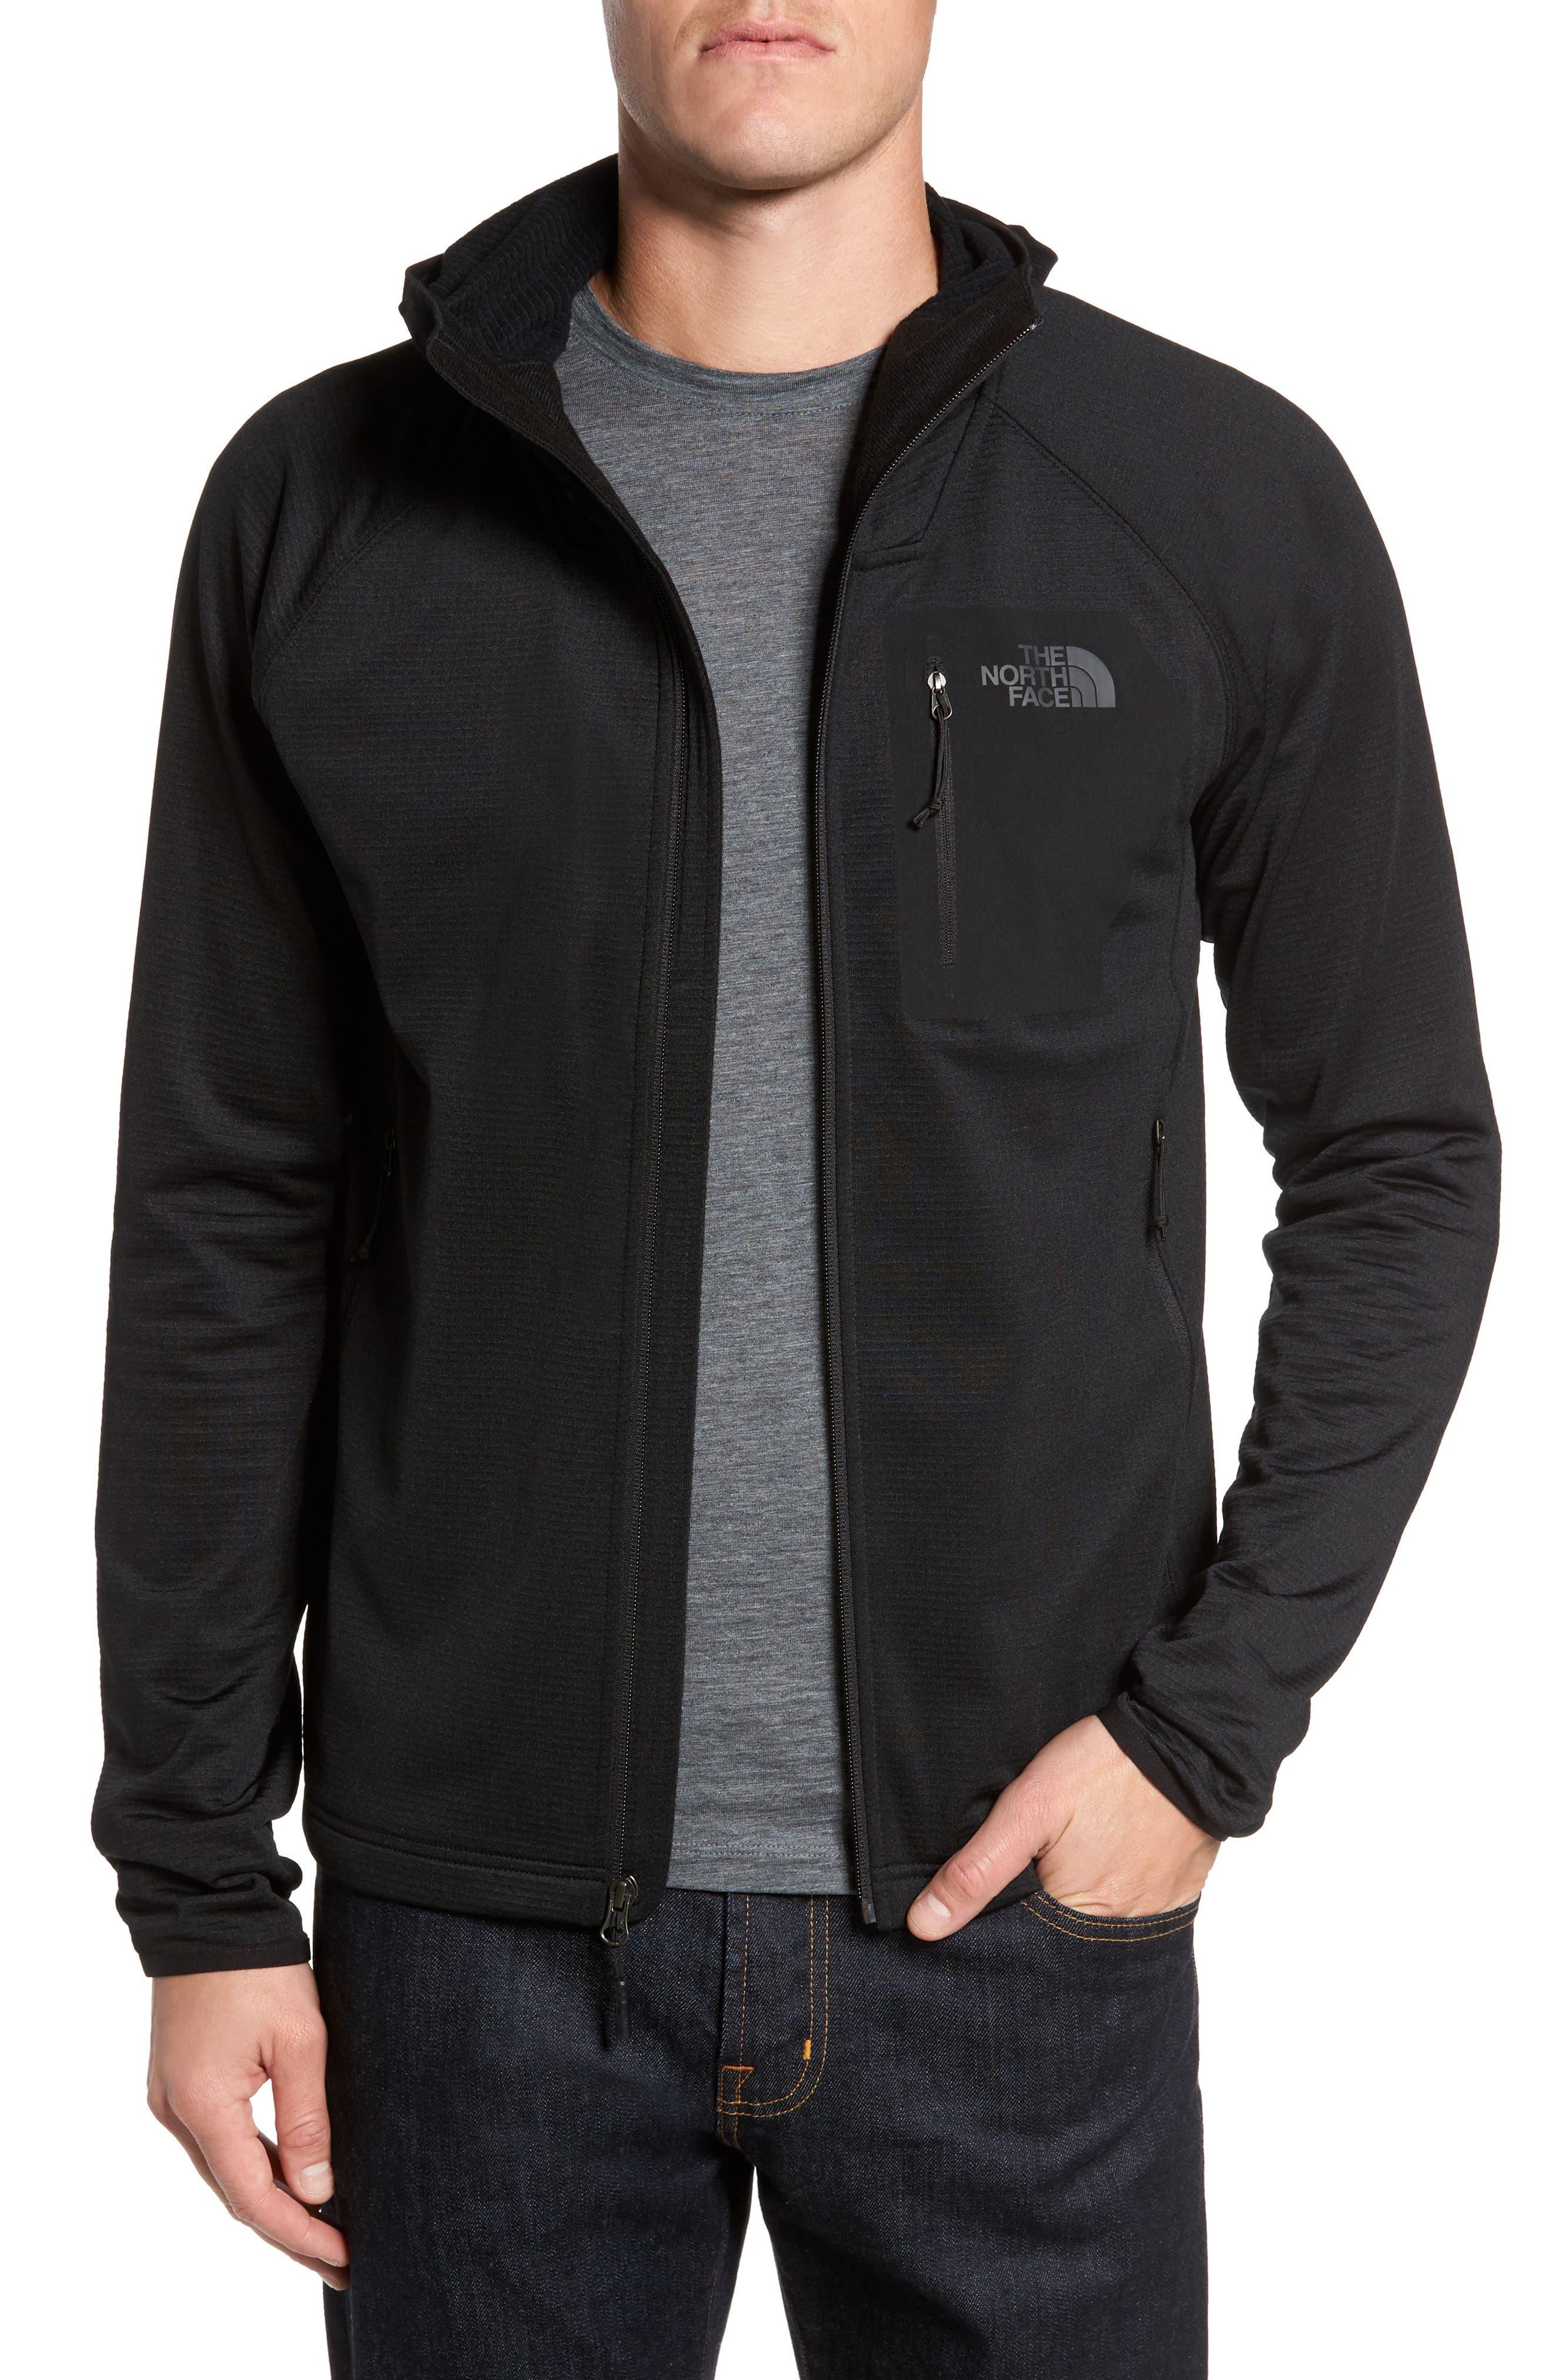 Main Image - The North Face Borod Zip Fleece Jacket